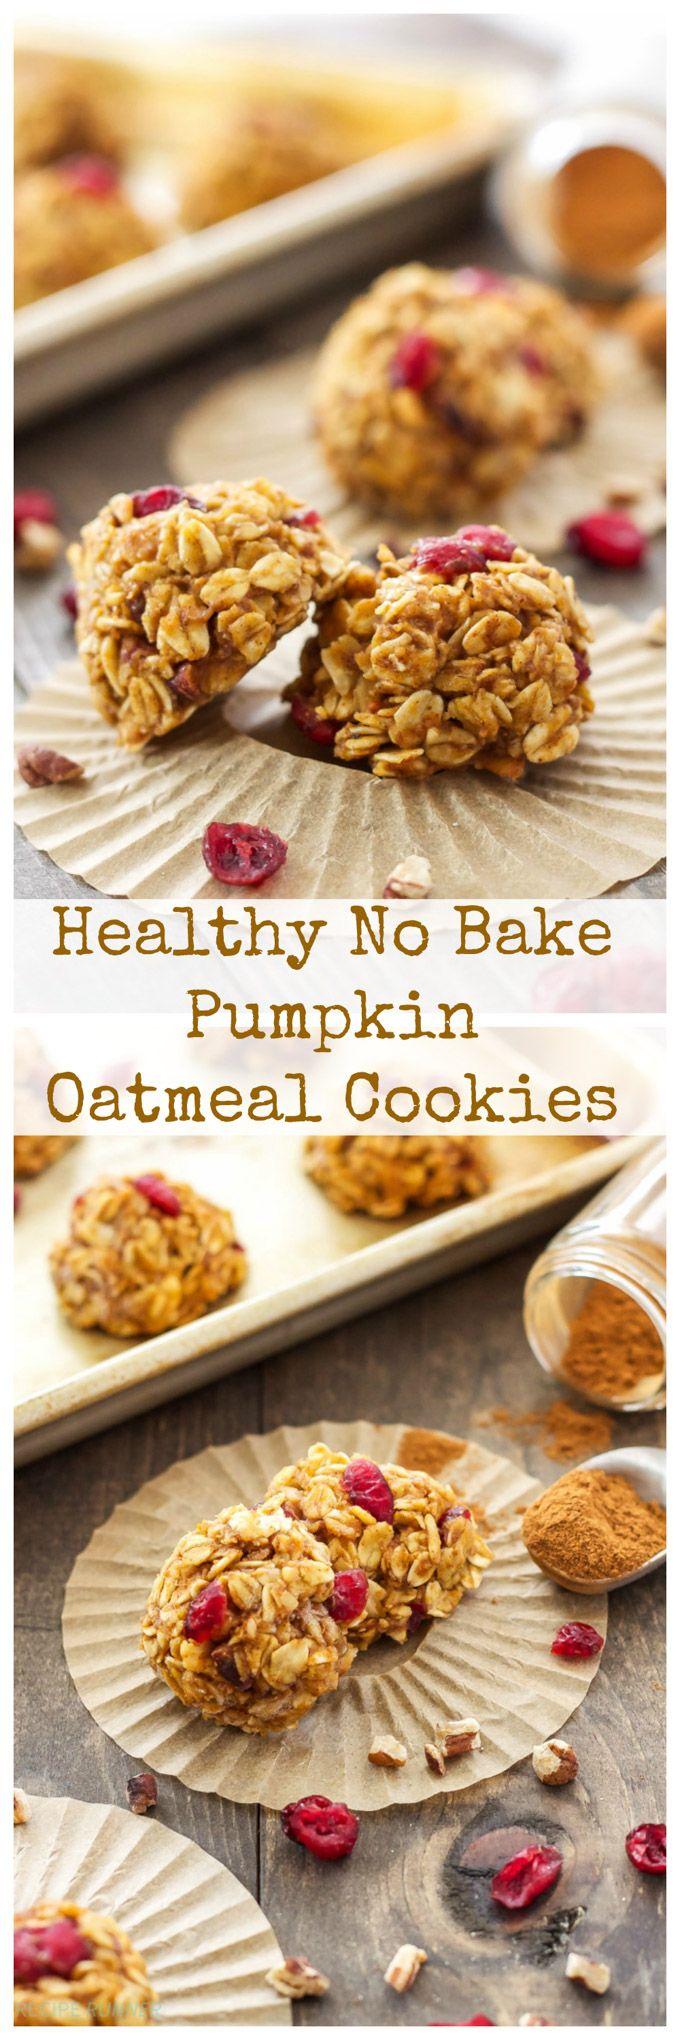 Healthy No Bake Pumpkin Oatmeal Cookies   These healthy pumpkin cookies are the perfect no bake fall treat!